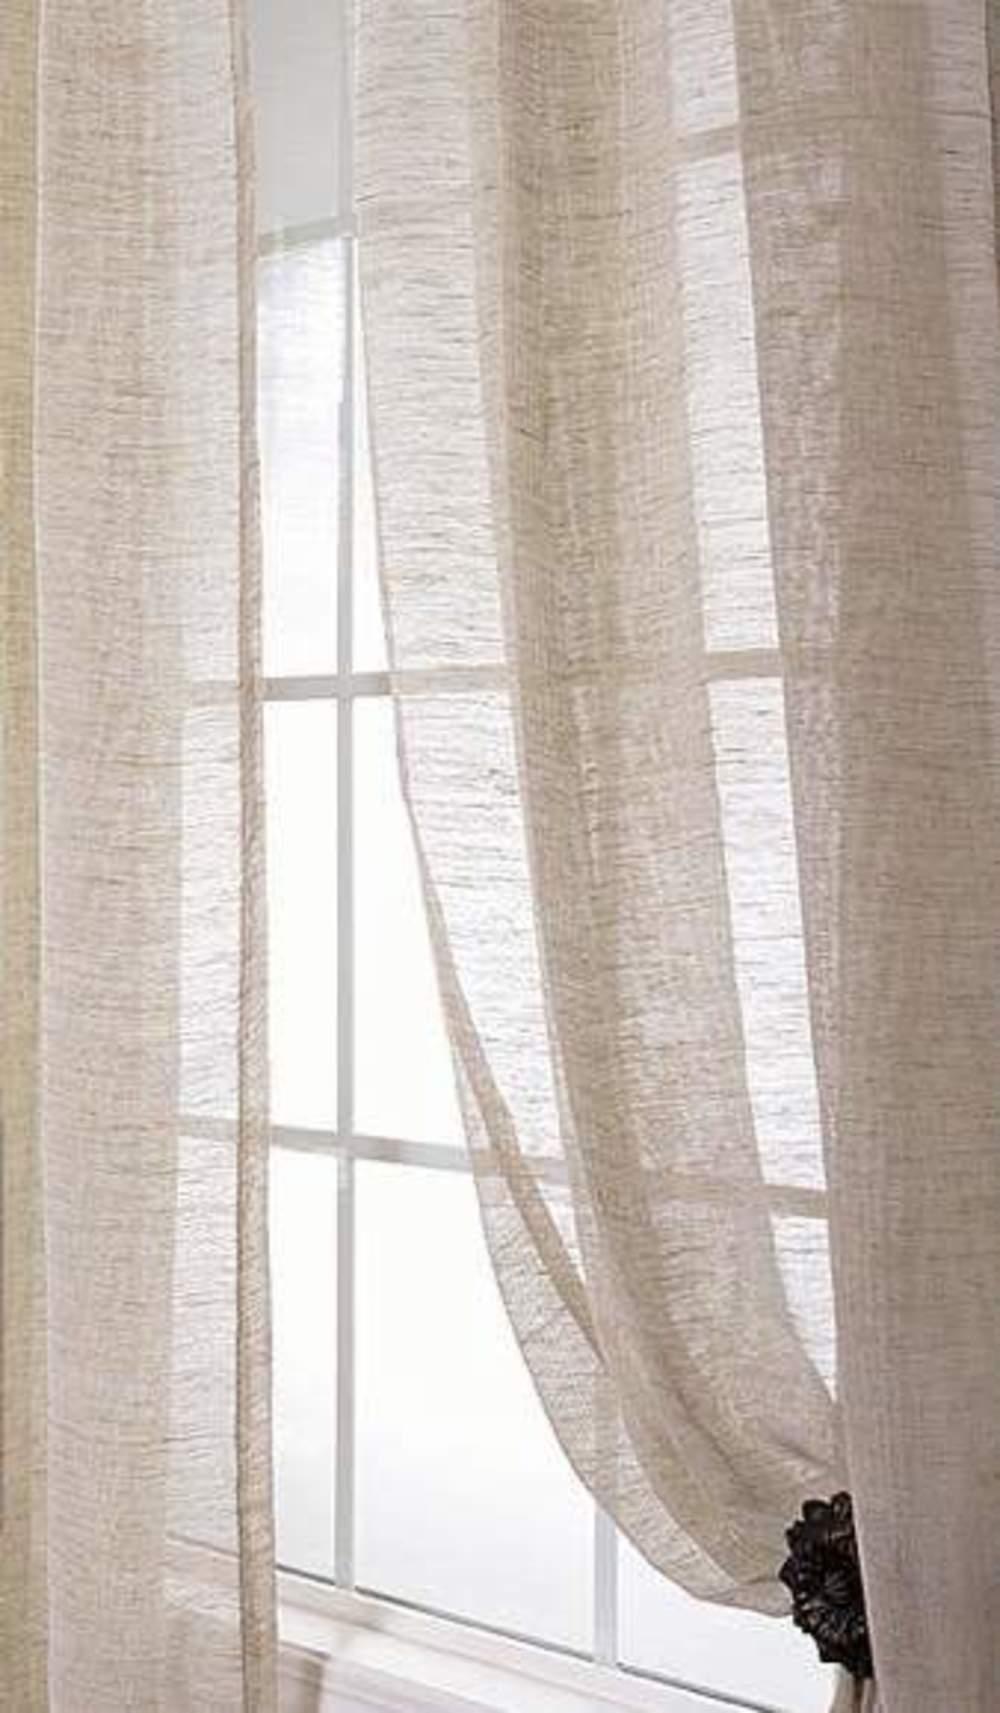 Amity Imports - Damara Ivory Linen Curtains